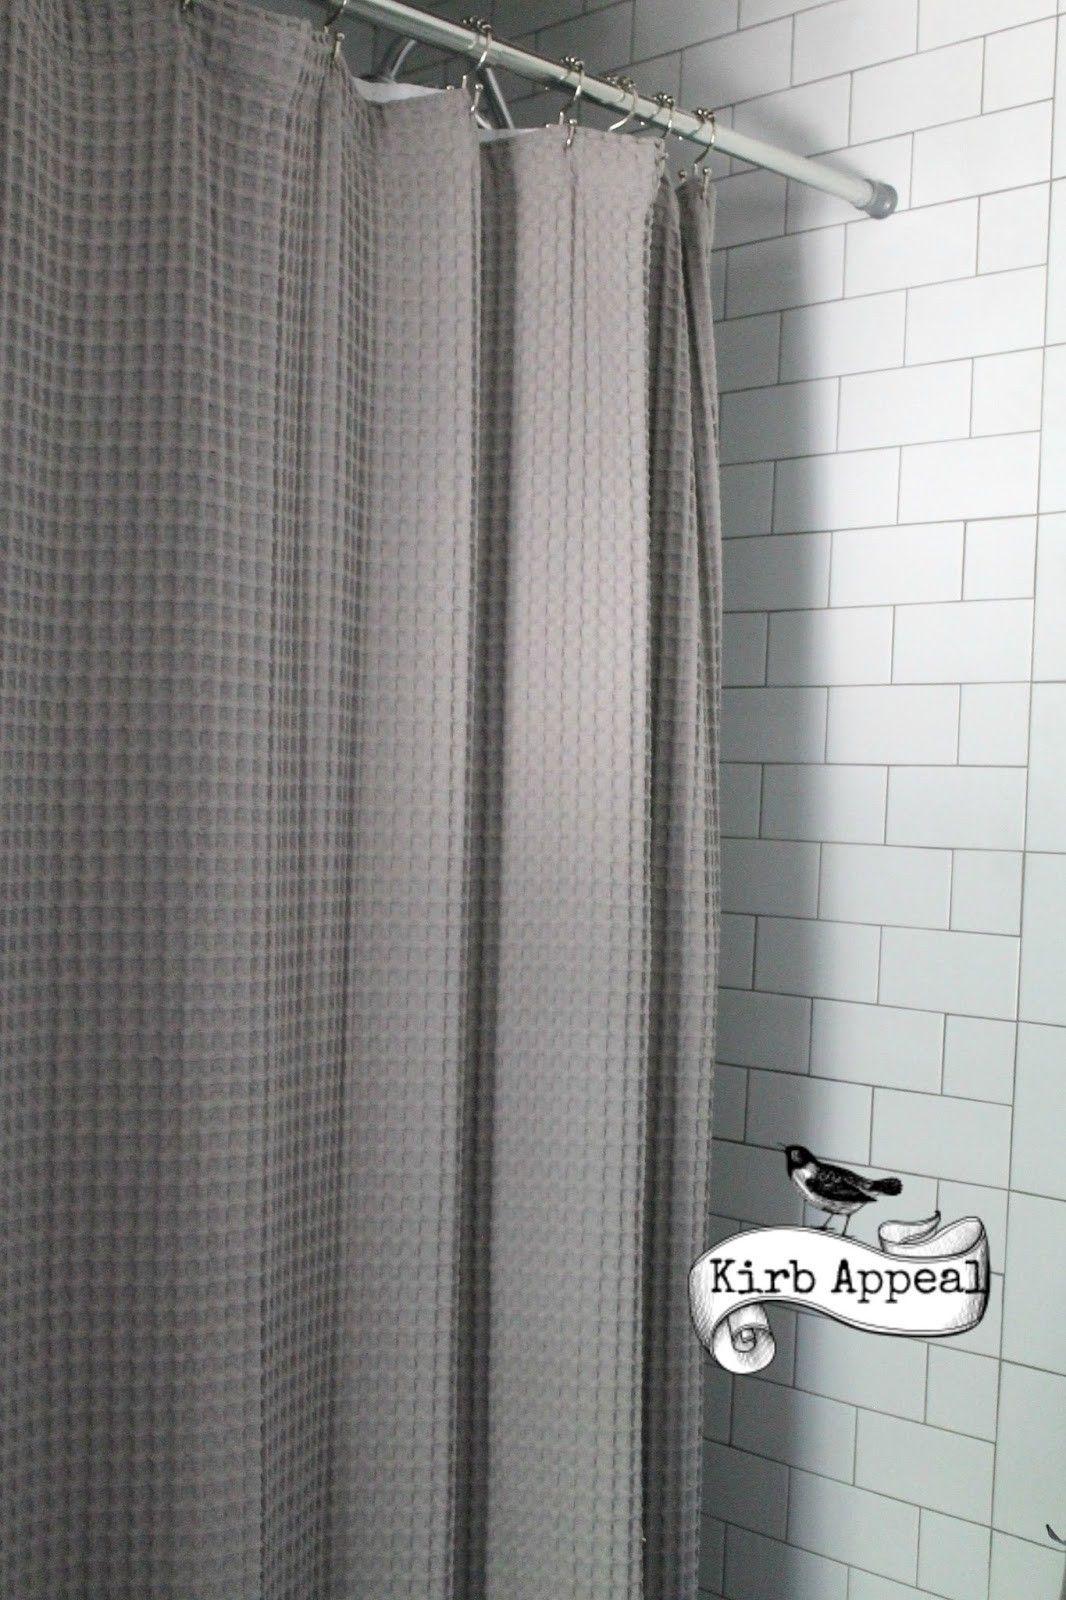 Bathroom cabinets bed bath and beyond & Bathroom cabinets bed bath and beyond | bathroom | Pinterest ...